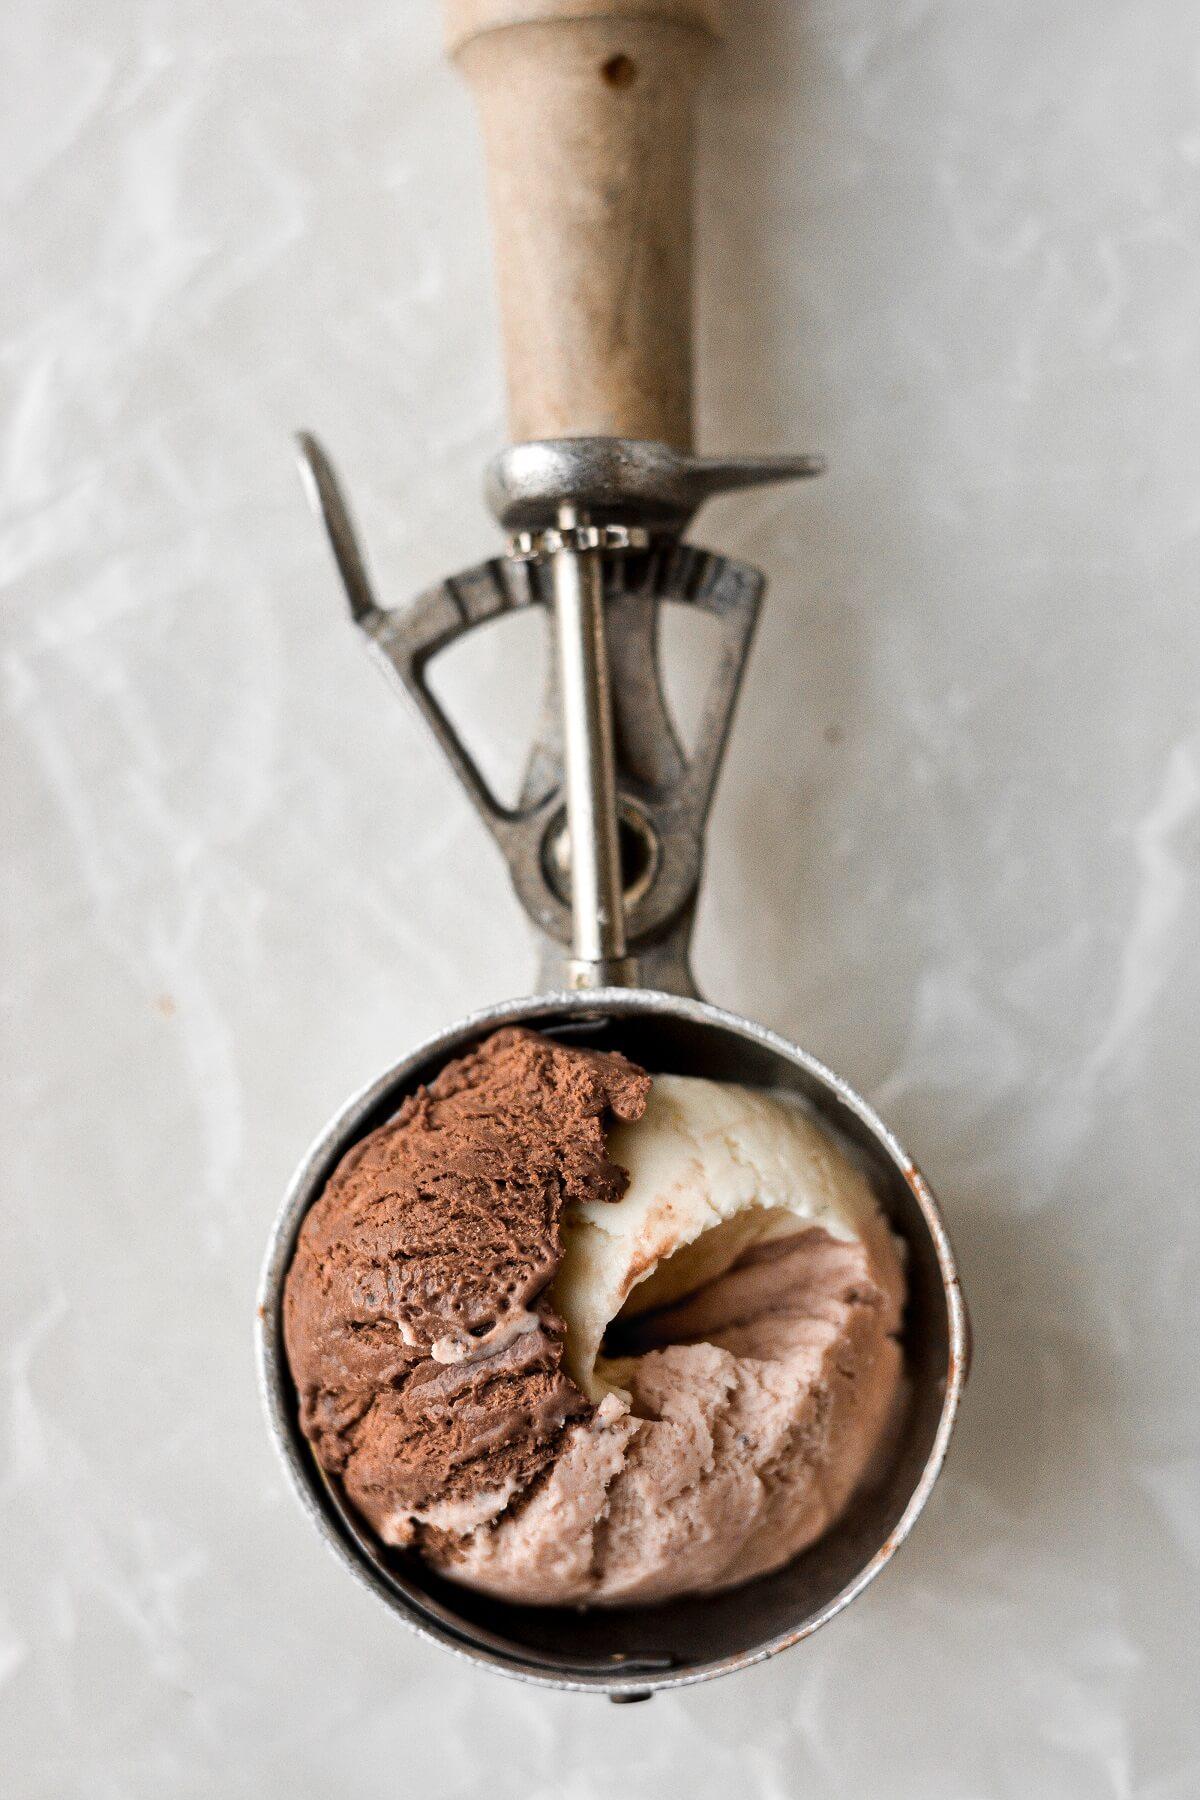 A scoop of neapolitan no churn ice cream in a vintage ice cream scoop.